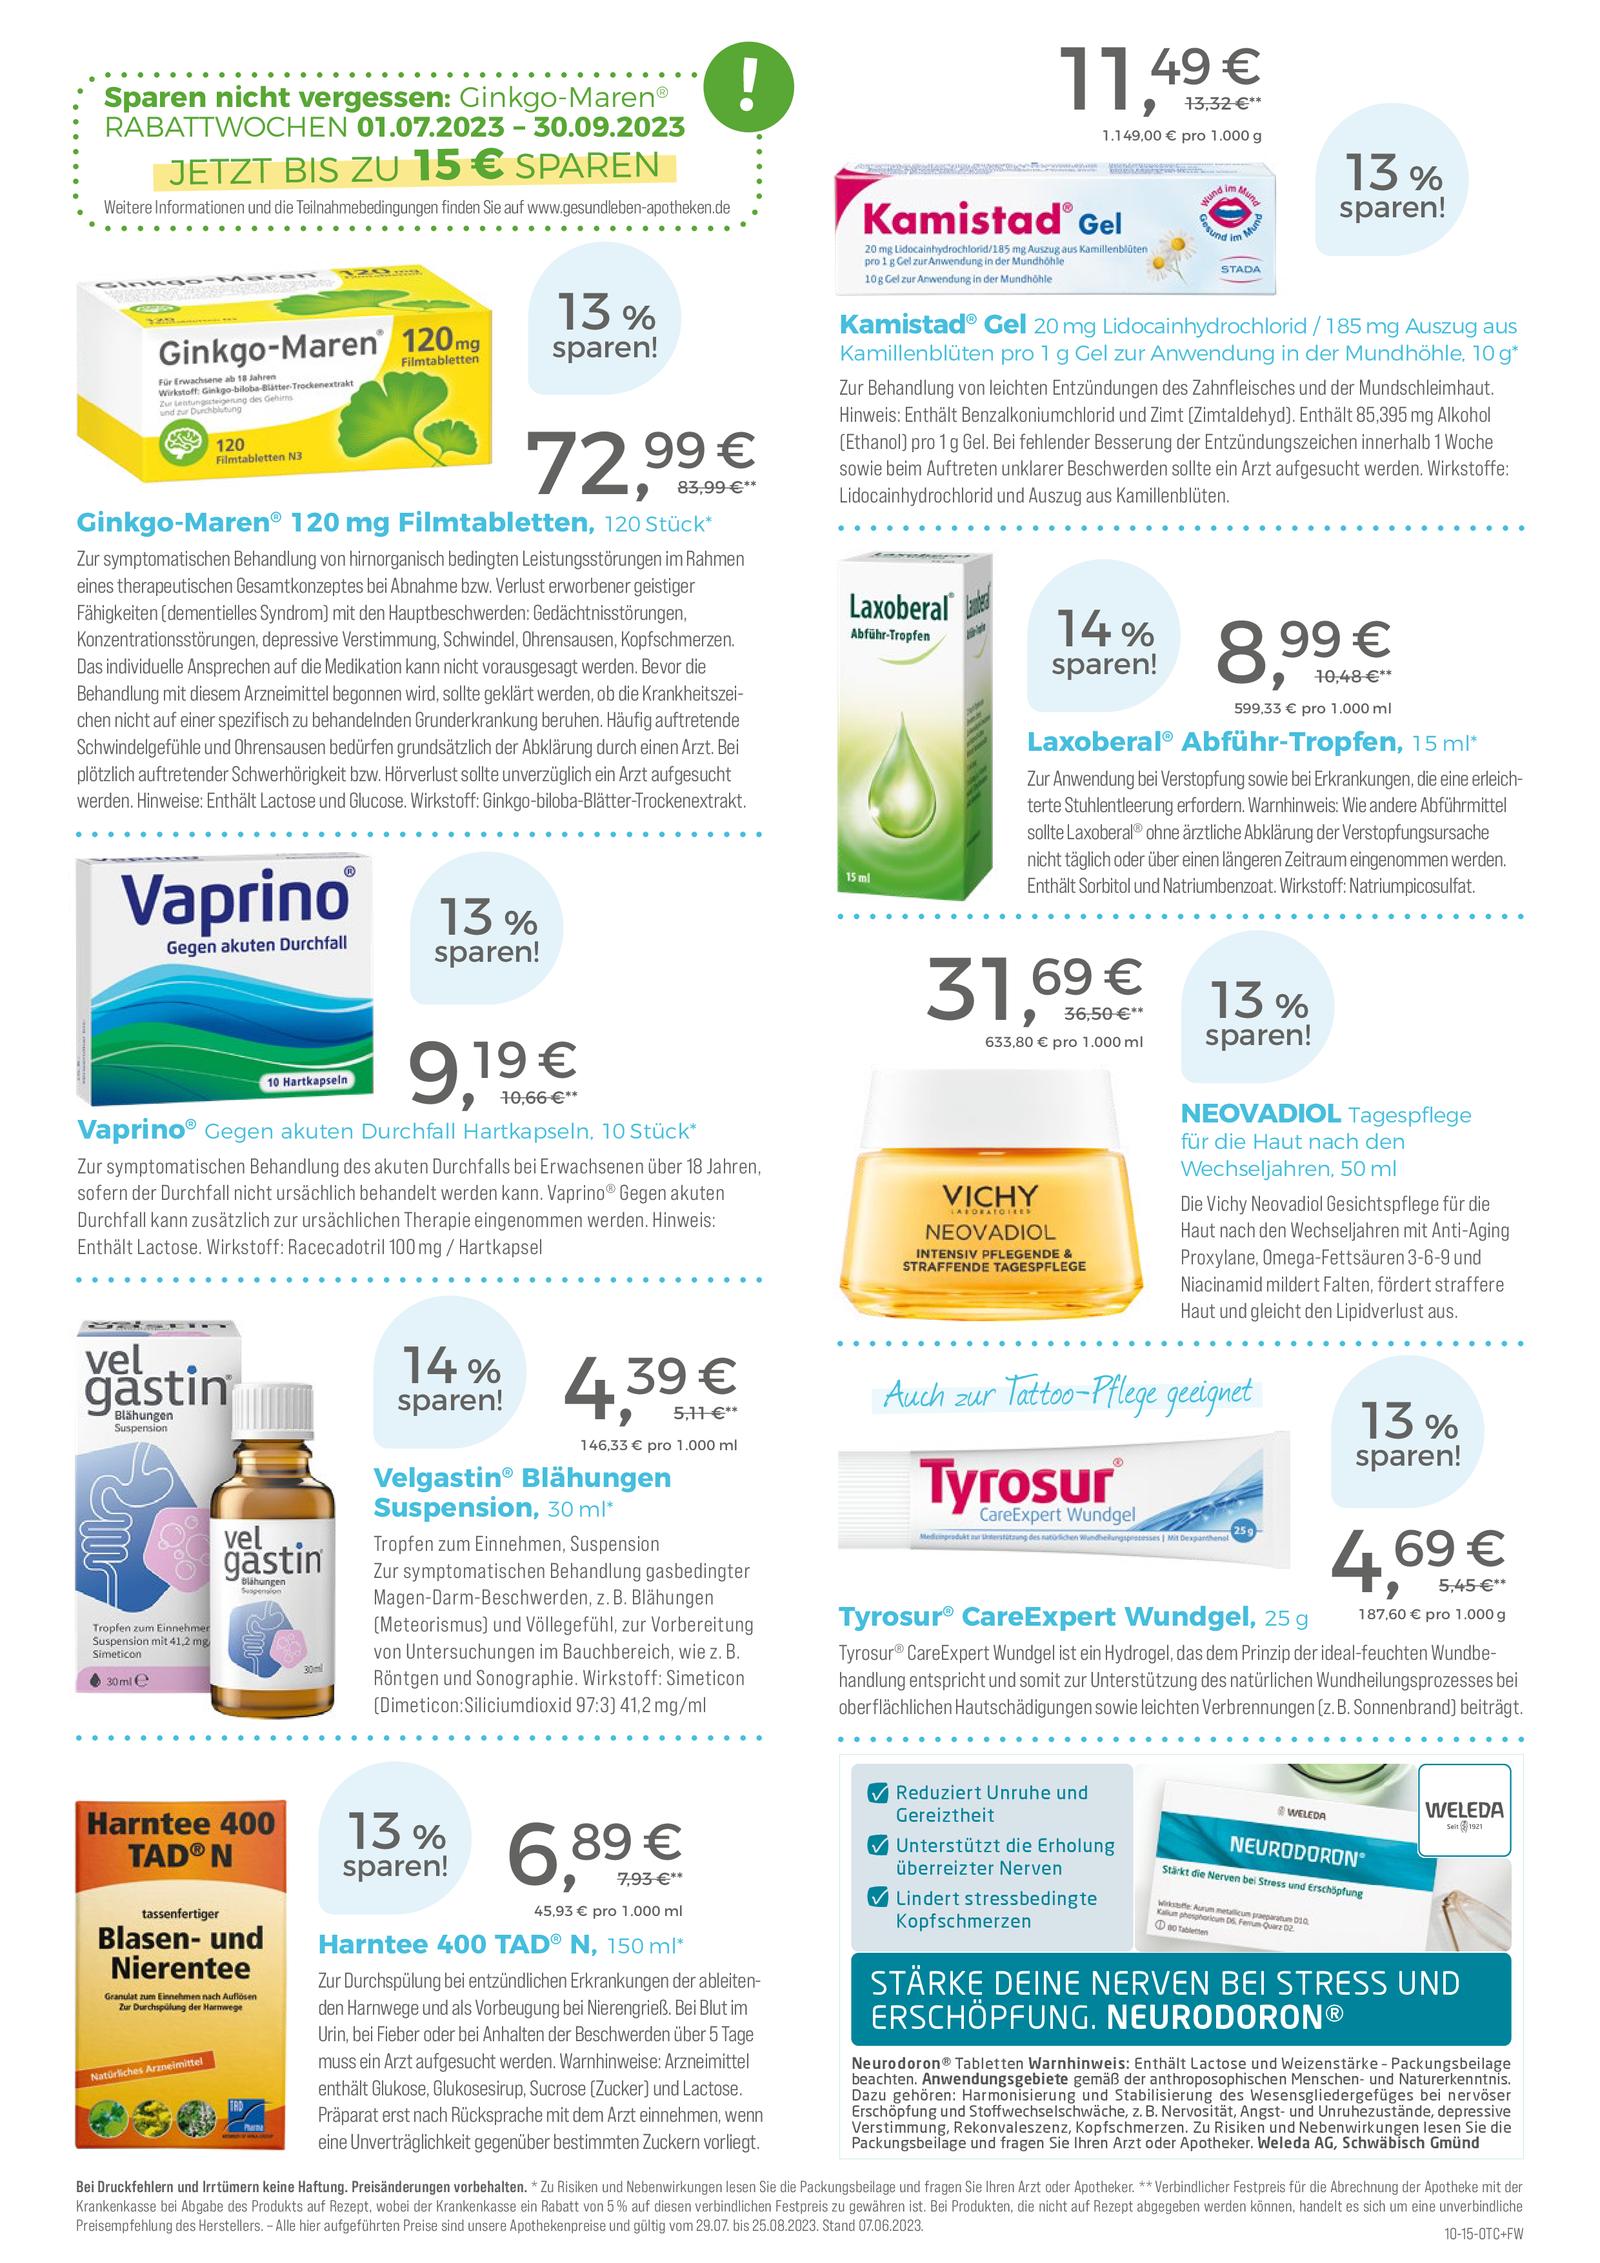 https://mein-uploads.apocdn.net/15933/leaflets/gesundleben_niedrig-Seite3.png